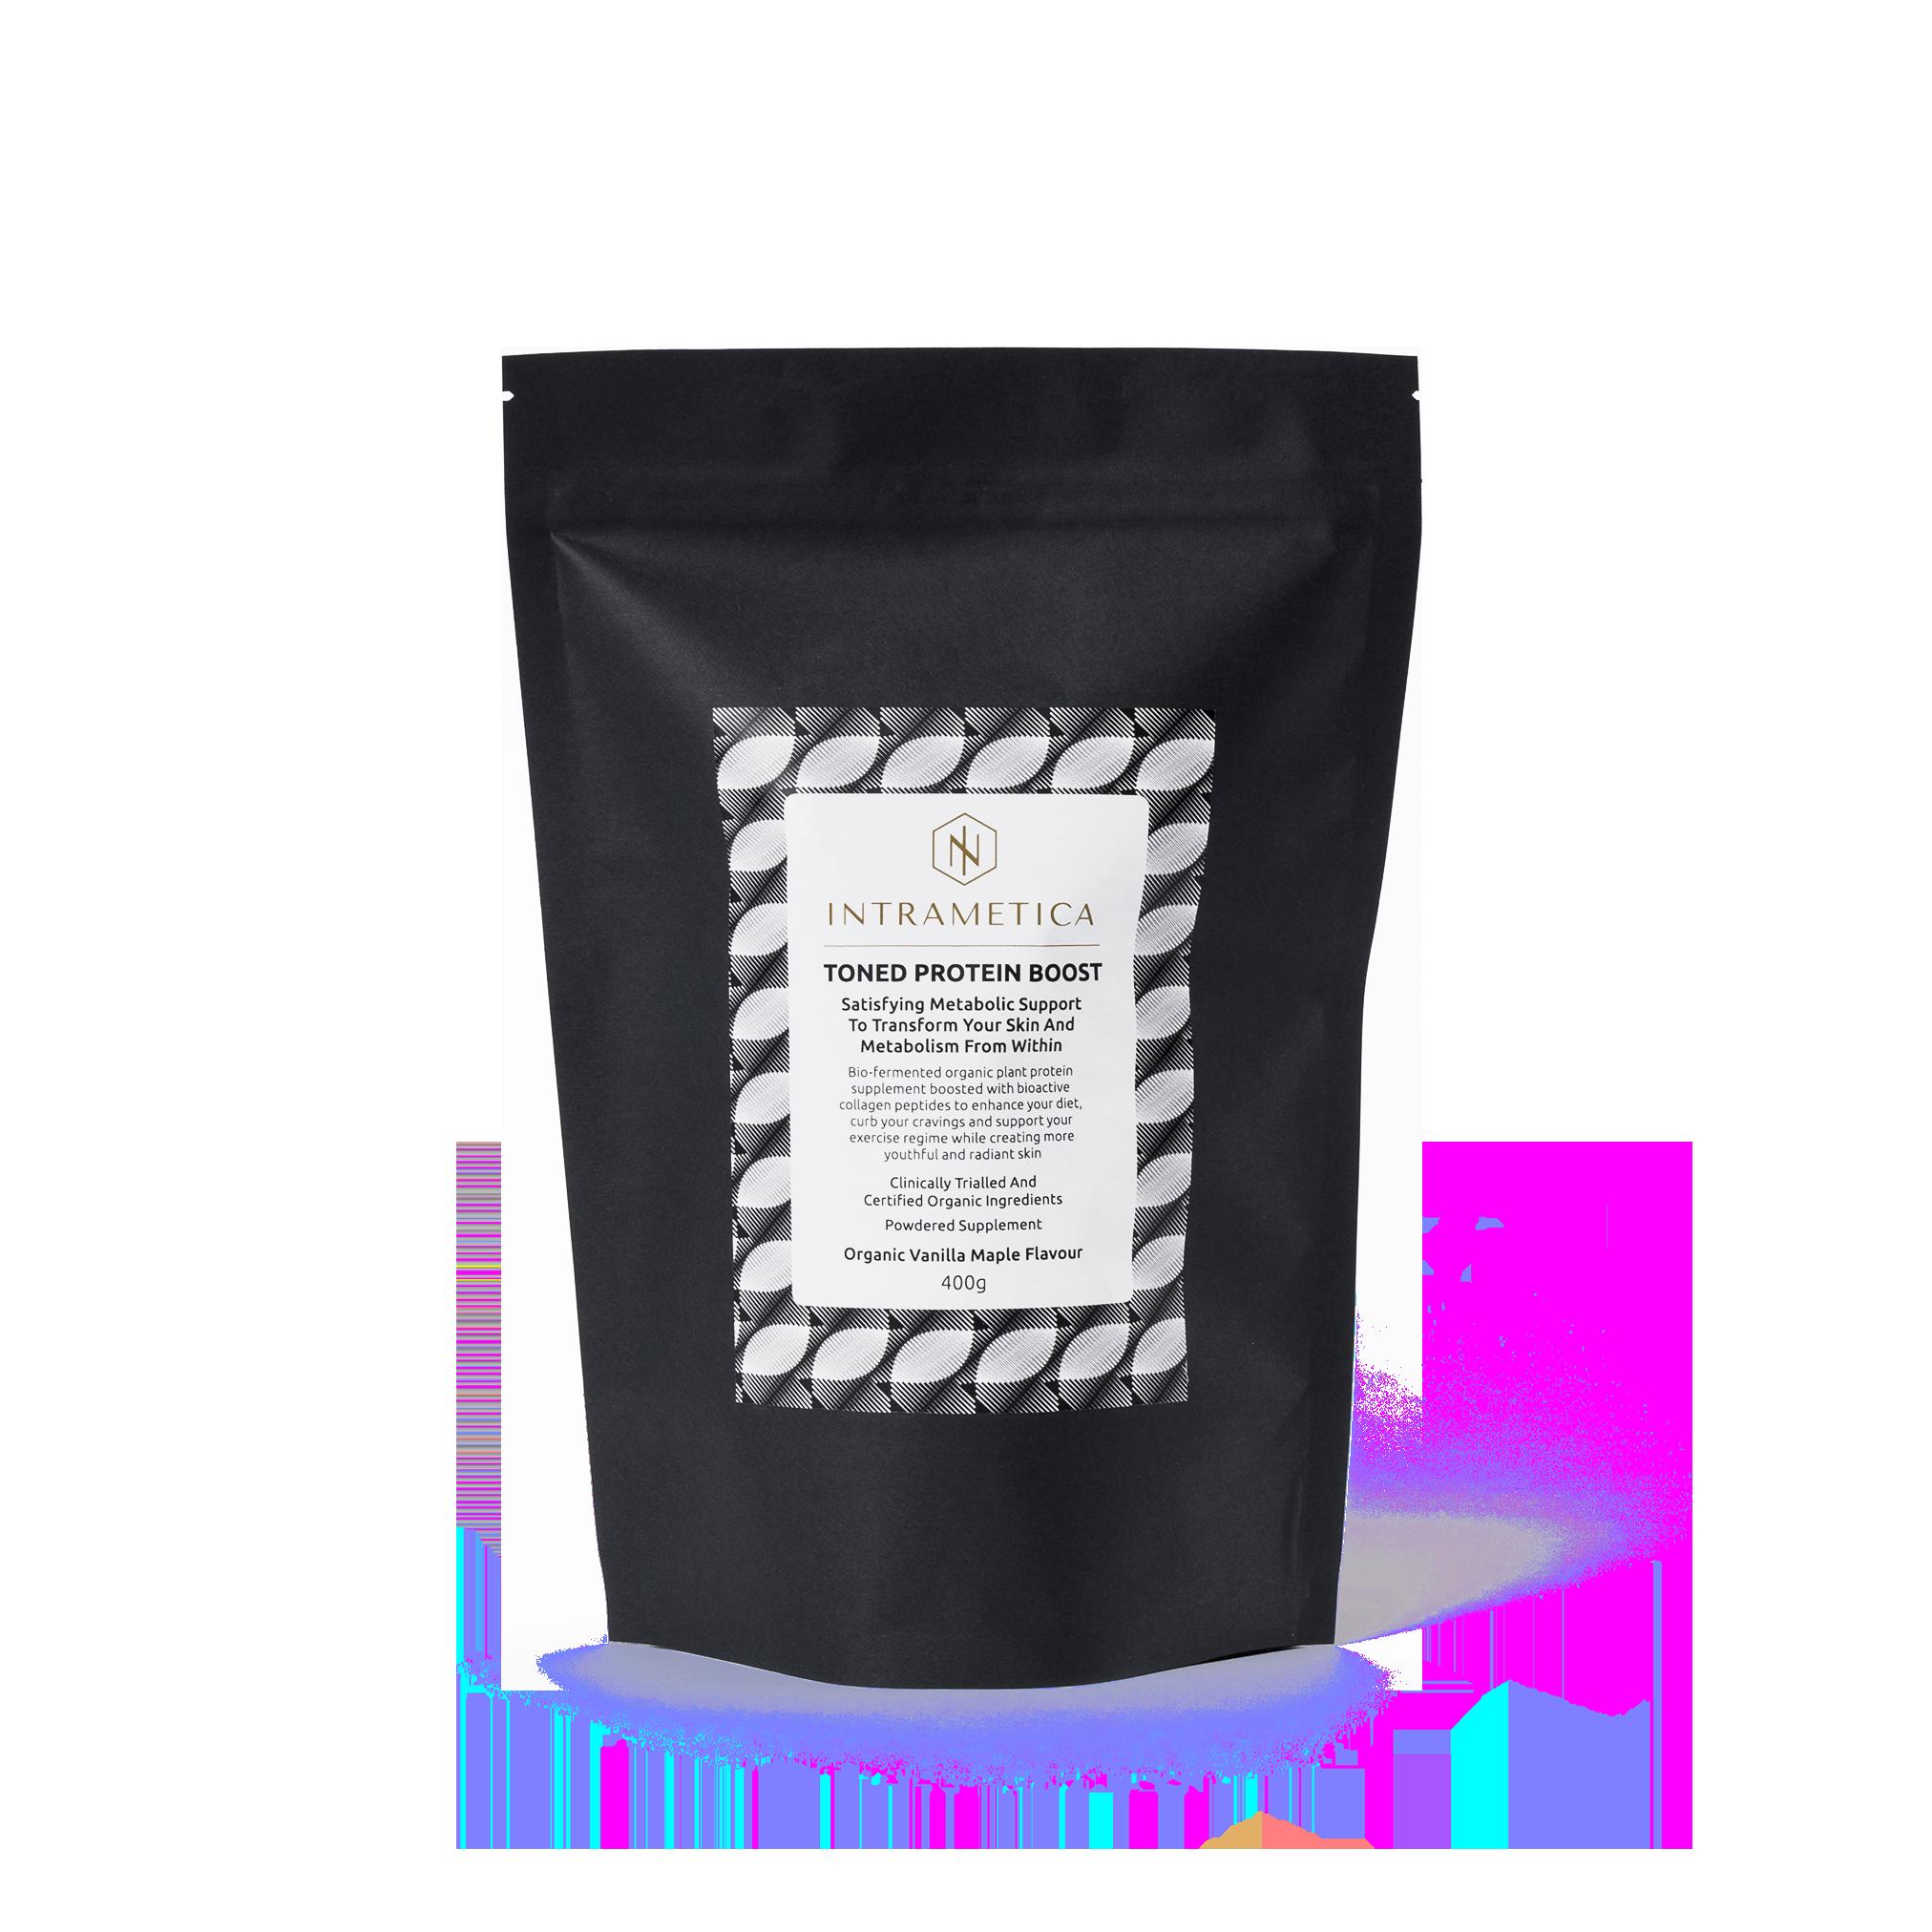 Intrametica Toned Protein Boost Pouch | 400g Organic Vanilla Maple